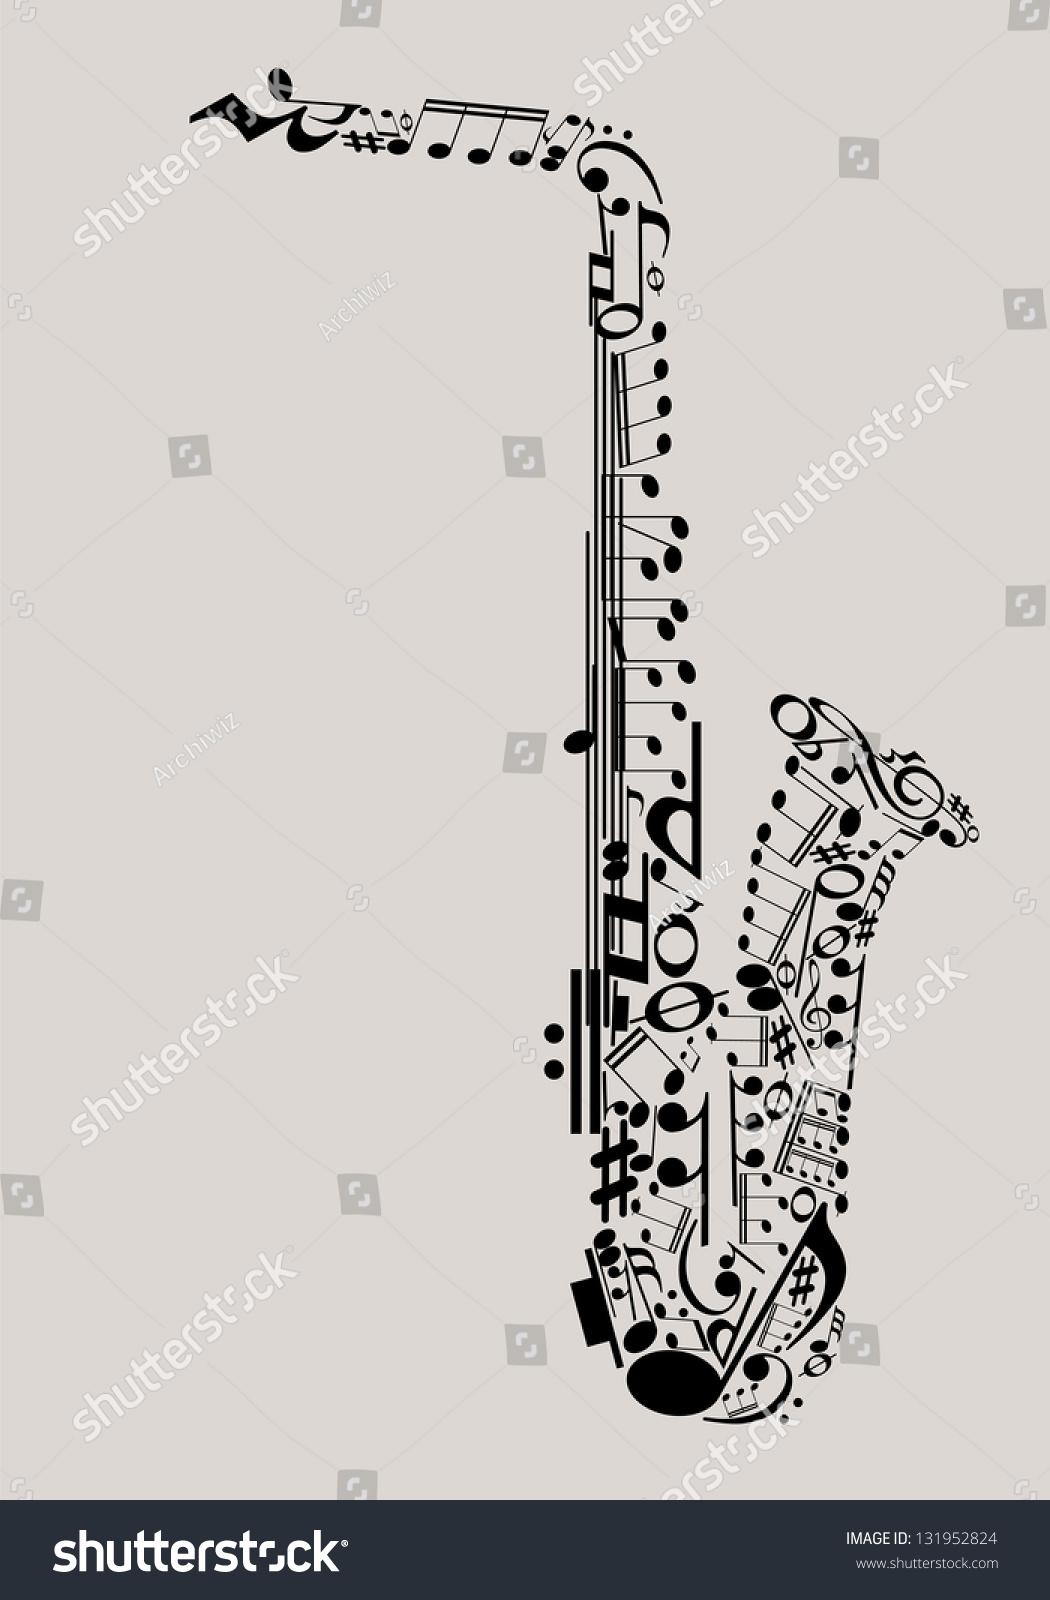 Jazz music saxophone made musical symbols stock vector 131952824 jazz music saxophone made with musical symbols for poster design buycottarizona Gallery